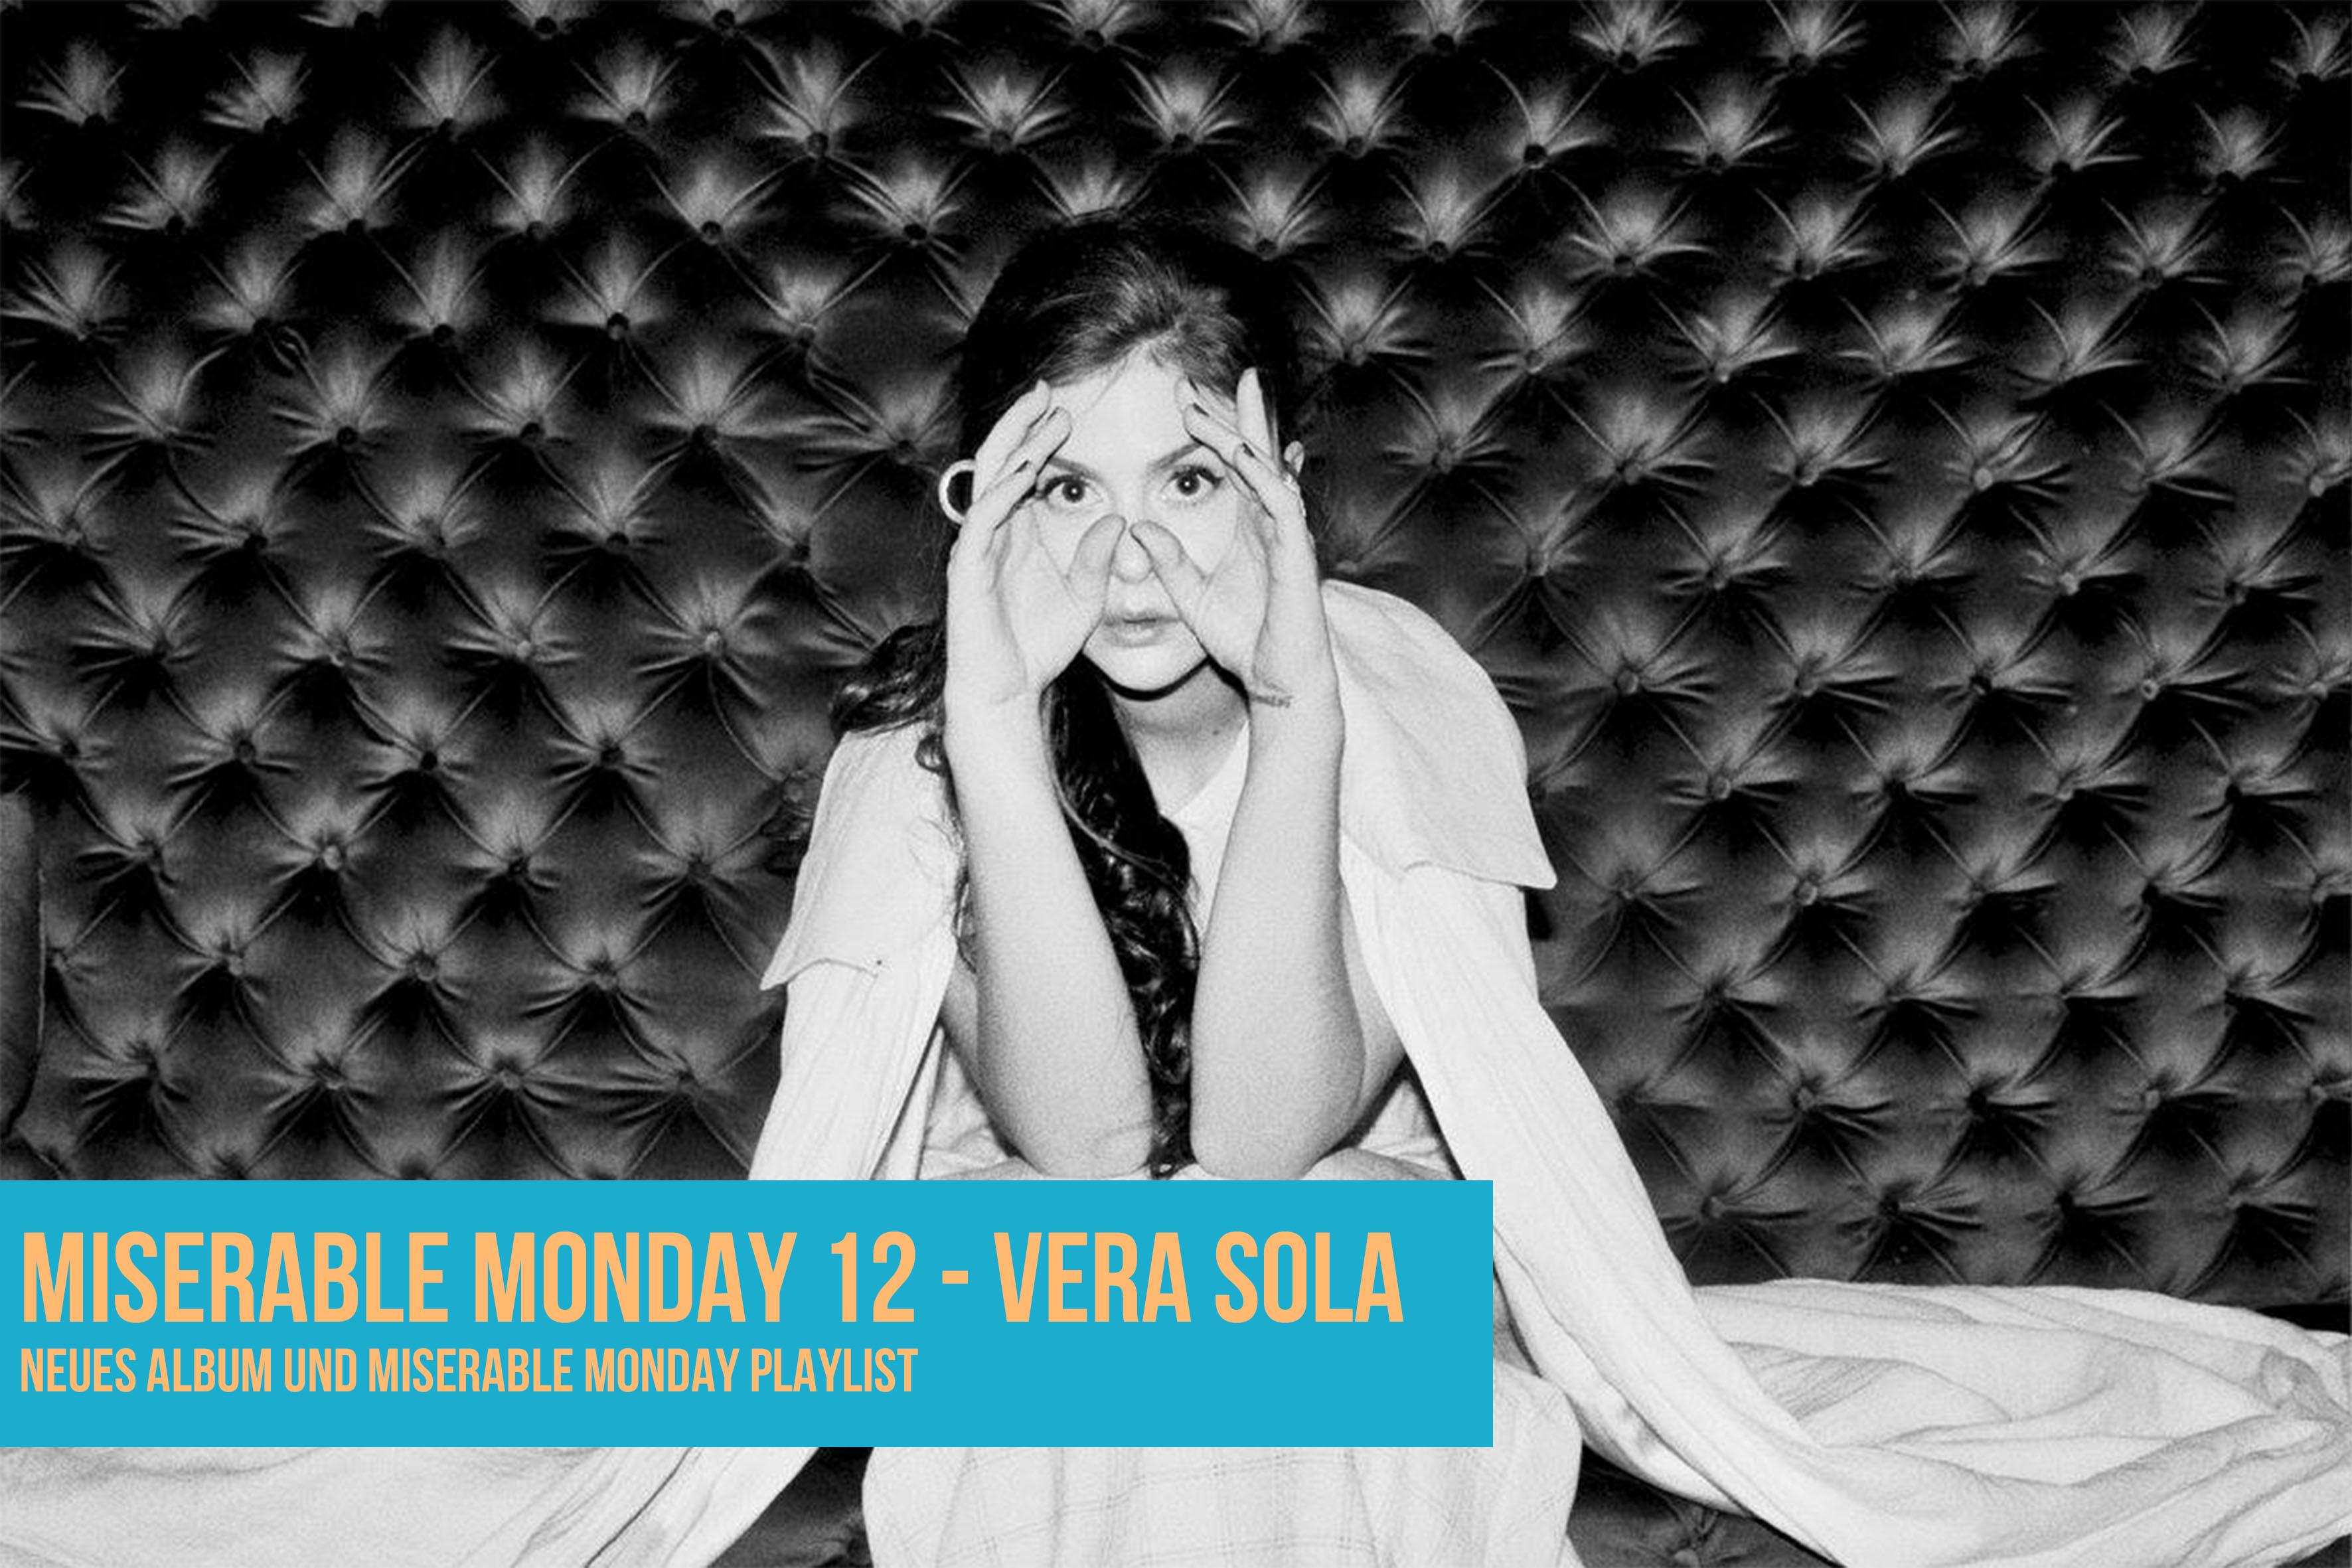 012 – Vera Sola